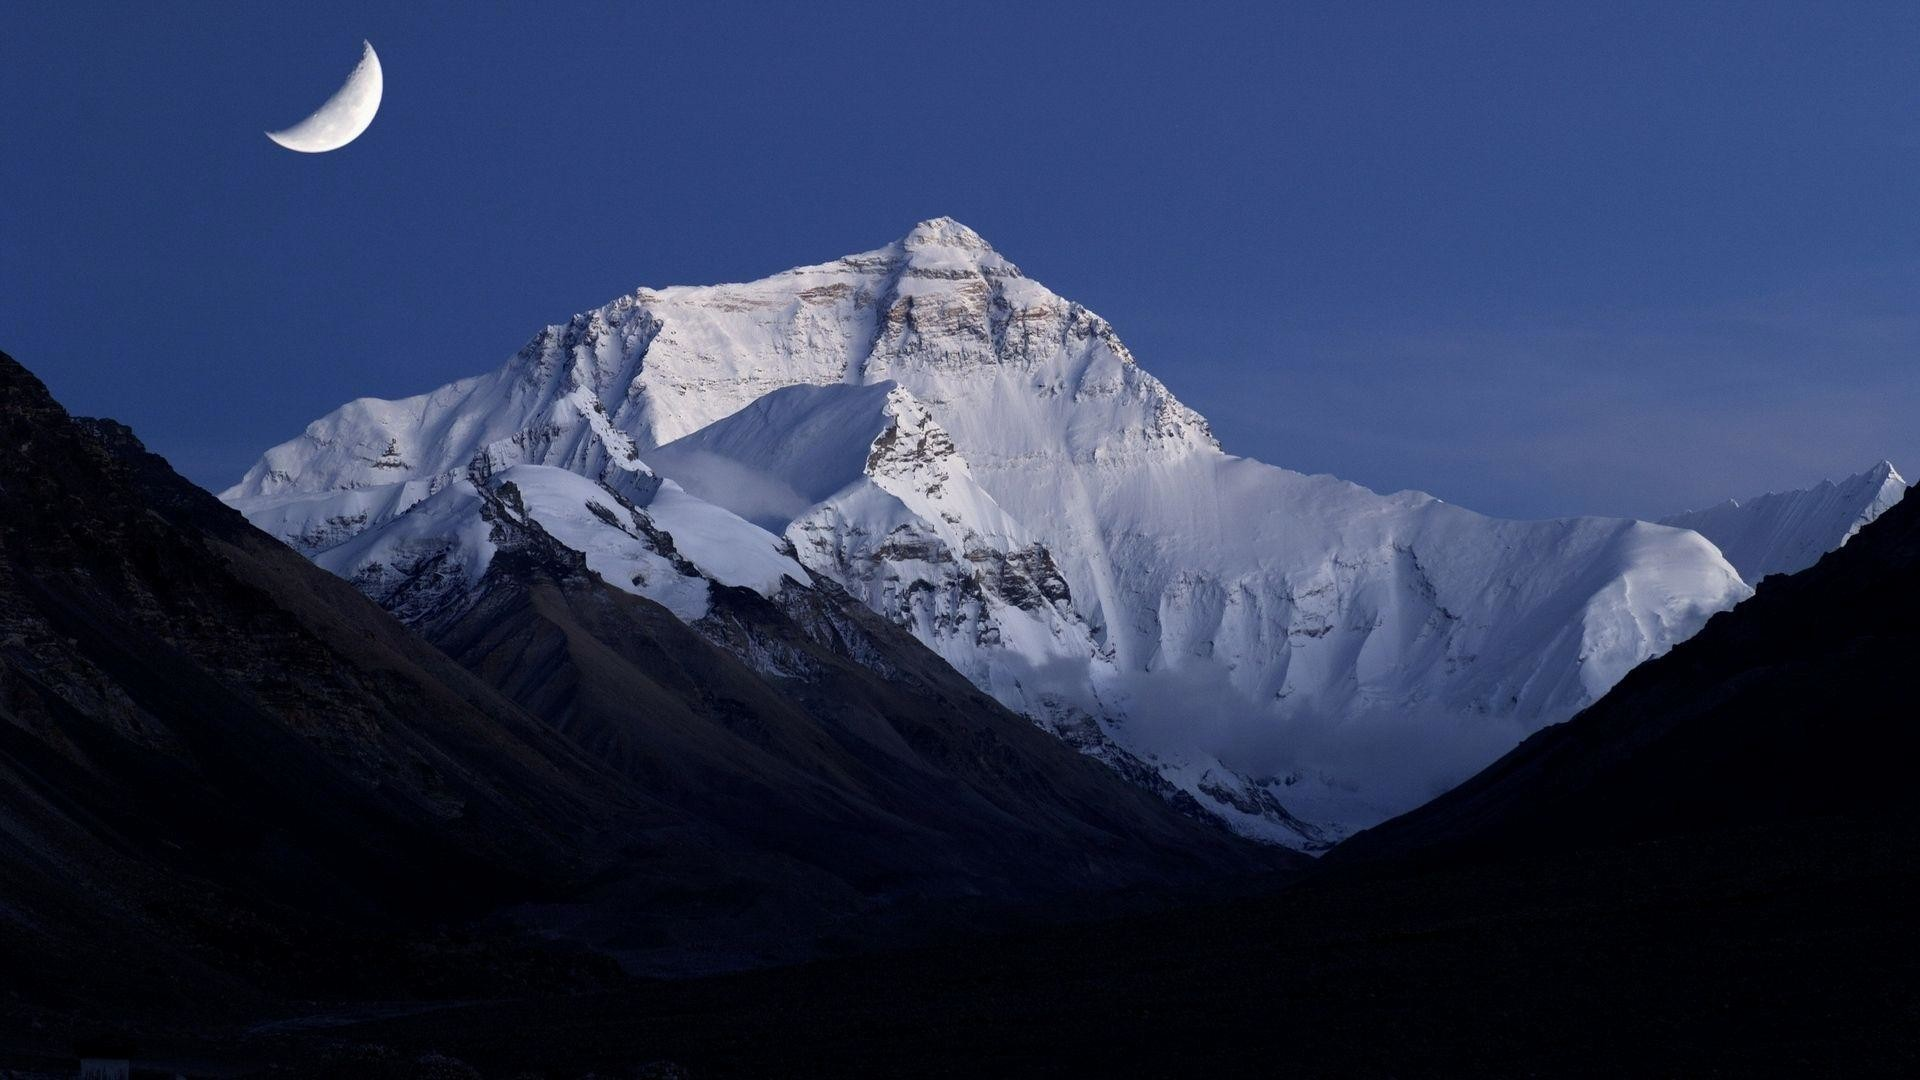 Mount-Everest-HD-1920×1080-wallpaper-wp2008202